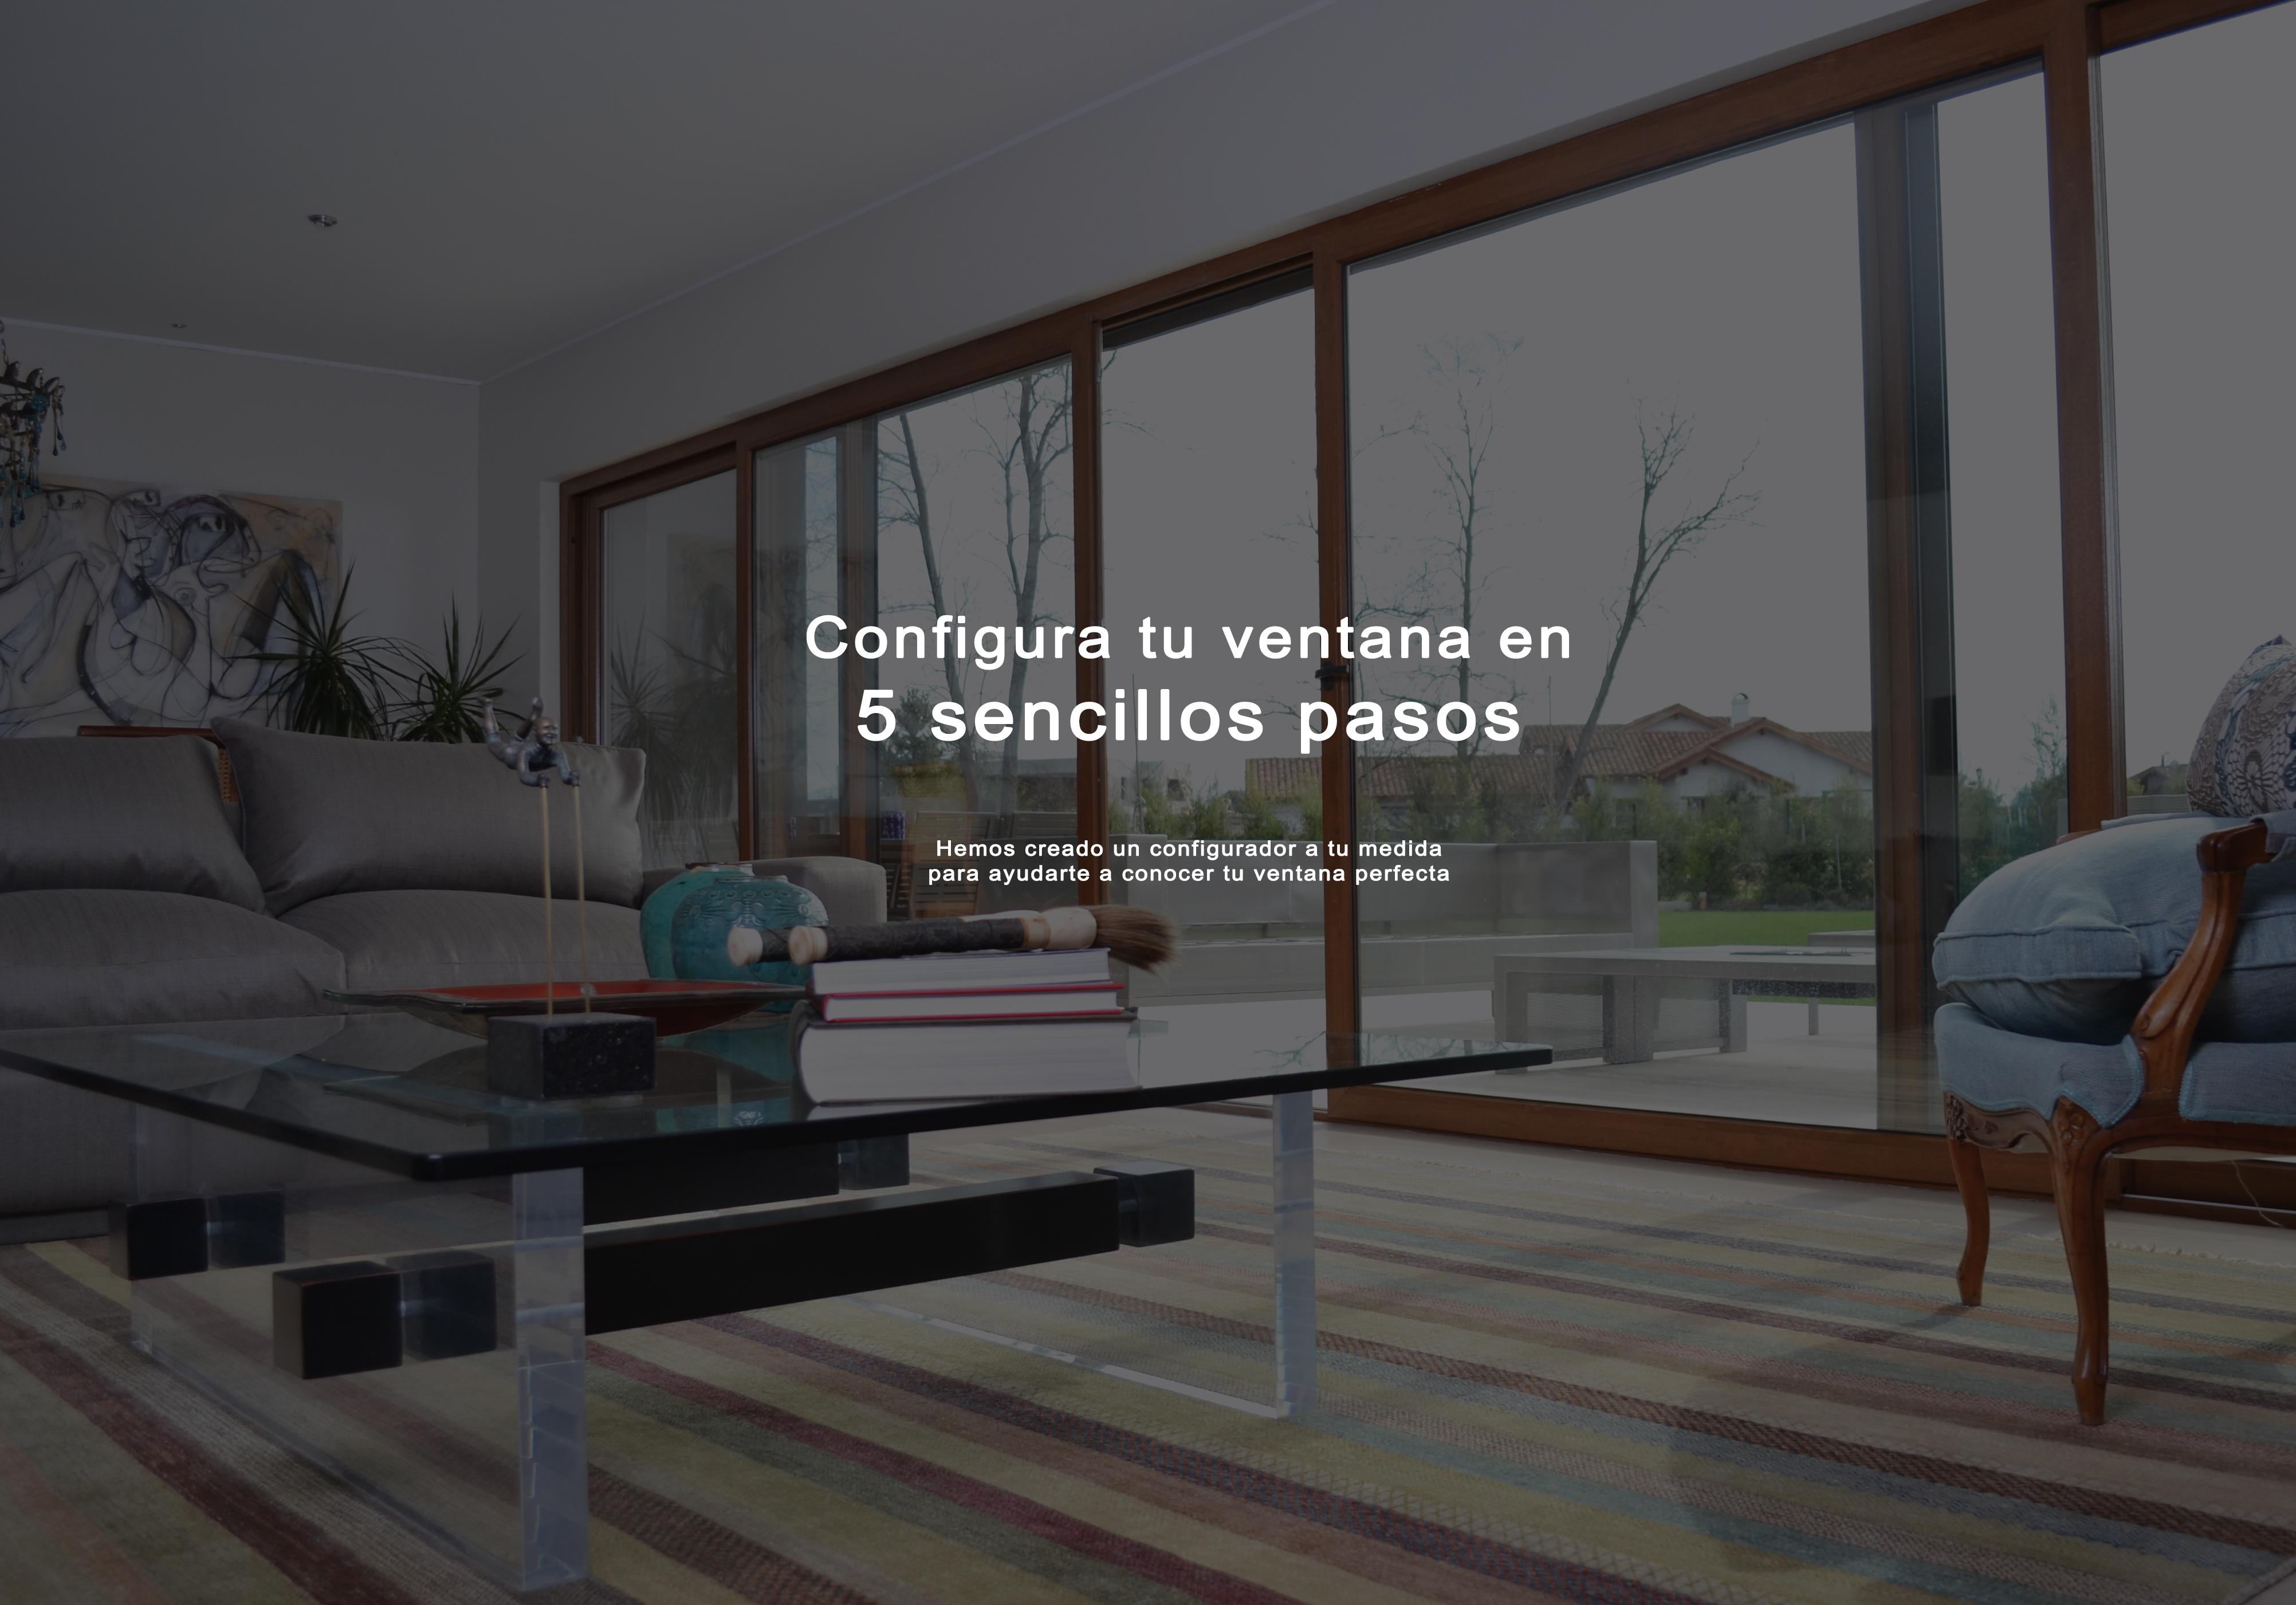 Configura tu ventana - Distribuidores kommerling ...